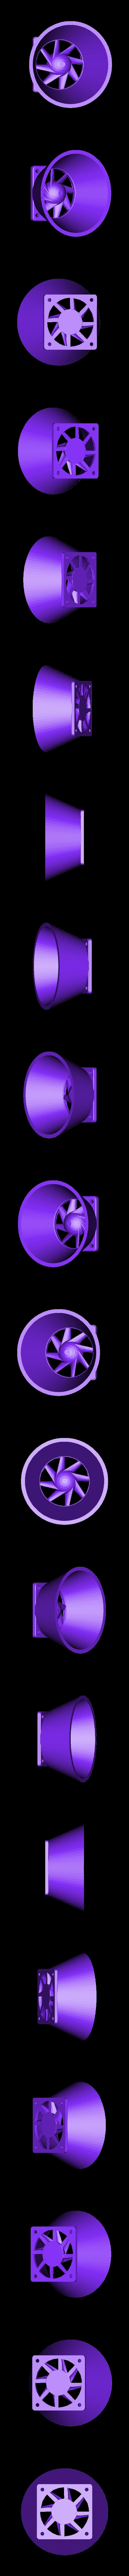 50mm_Velocity_Stack_wGuard.stl Download free STL file Wanhao & Tevo Tarantula 30mm Fan to 50mm Fan Adapter • 3D printable design, DIY3DTech